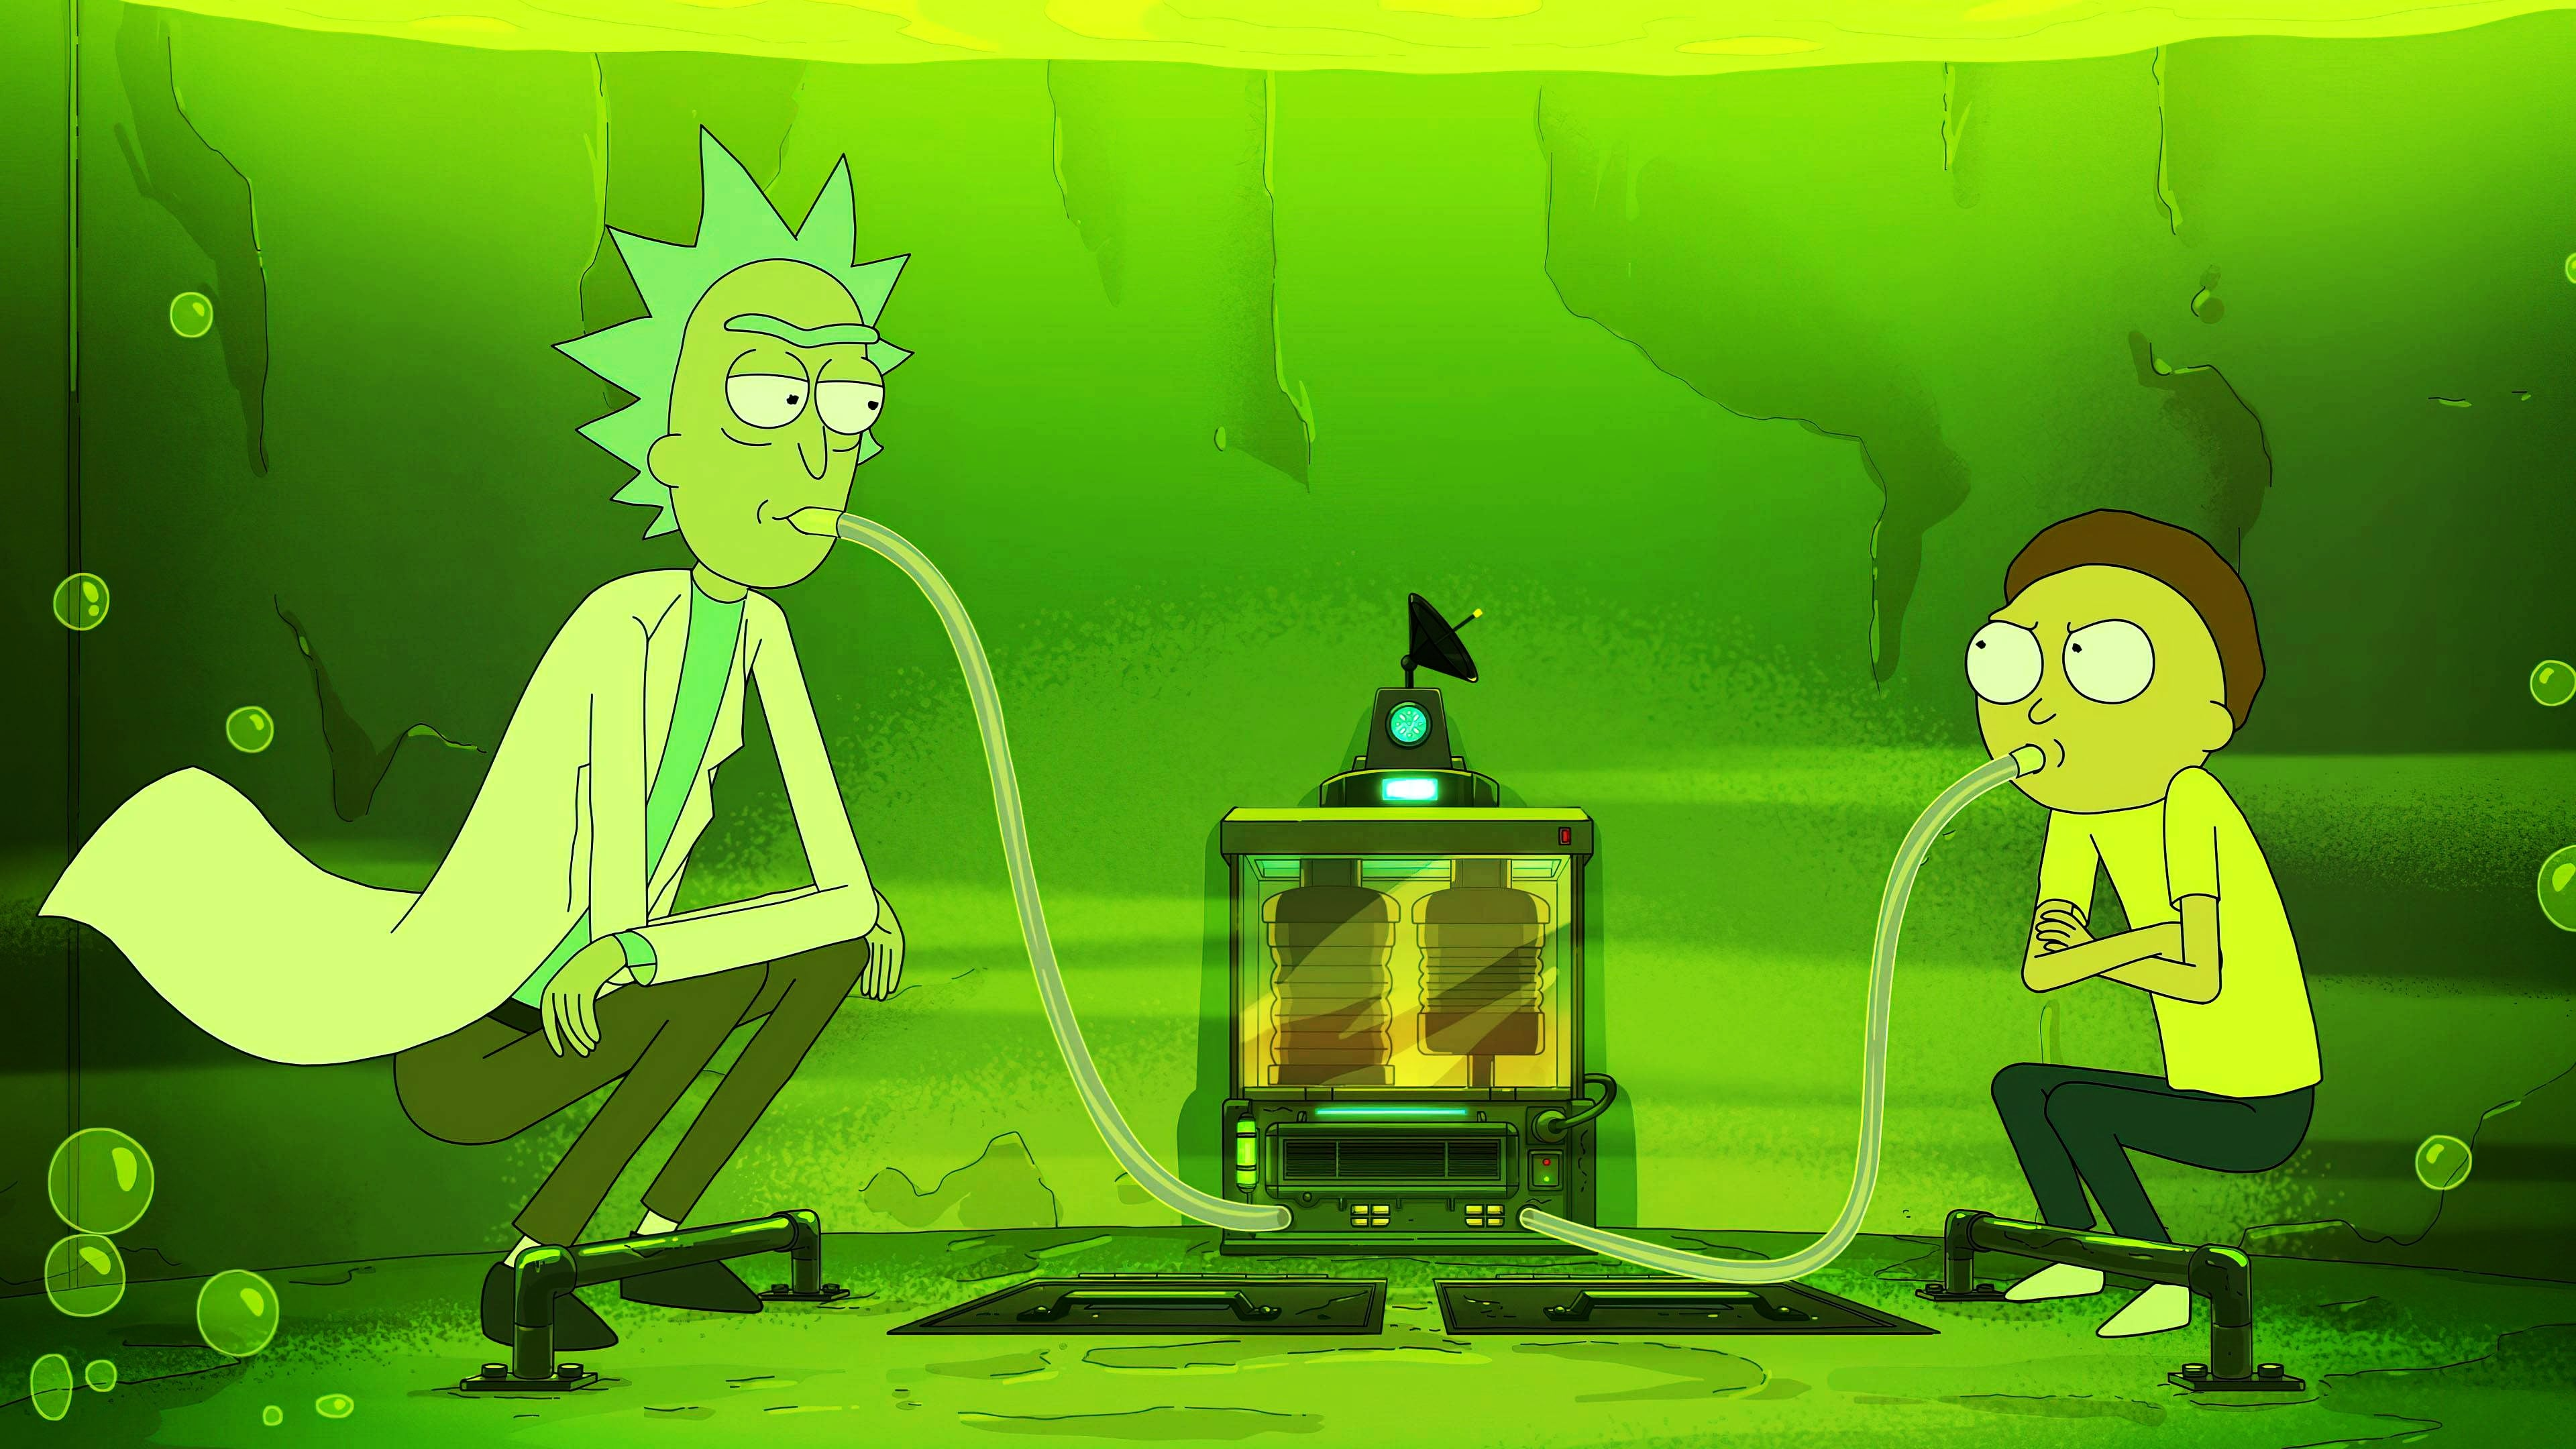 Rick and Morty - Season 4 Episode 8 : The Vat of Acid Episode